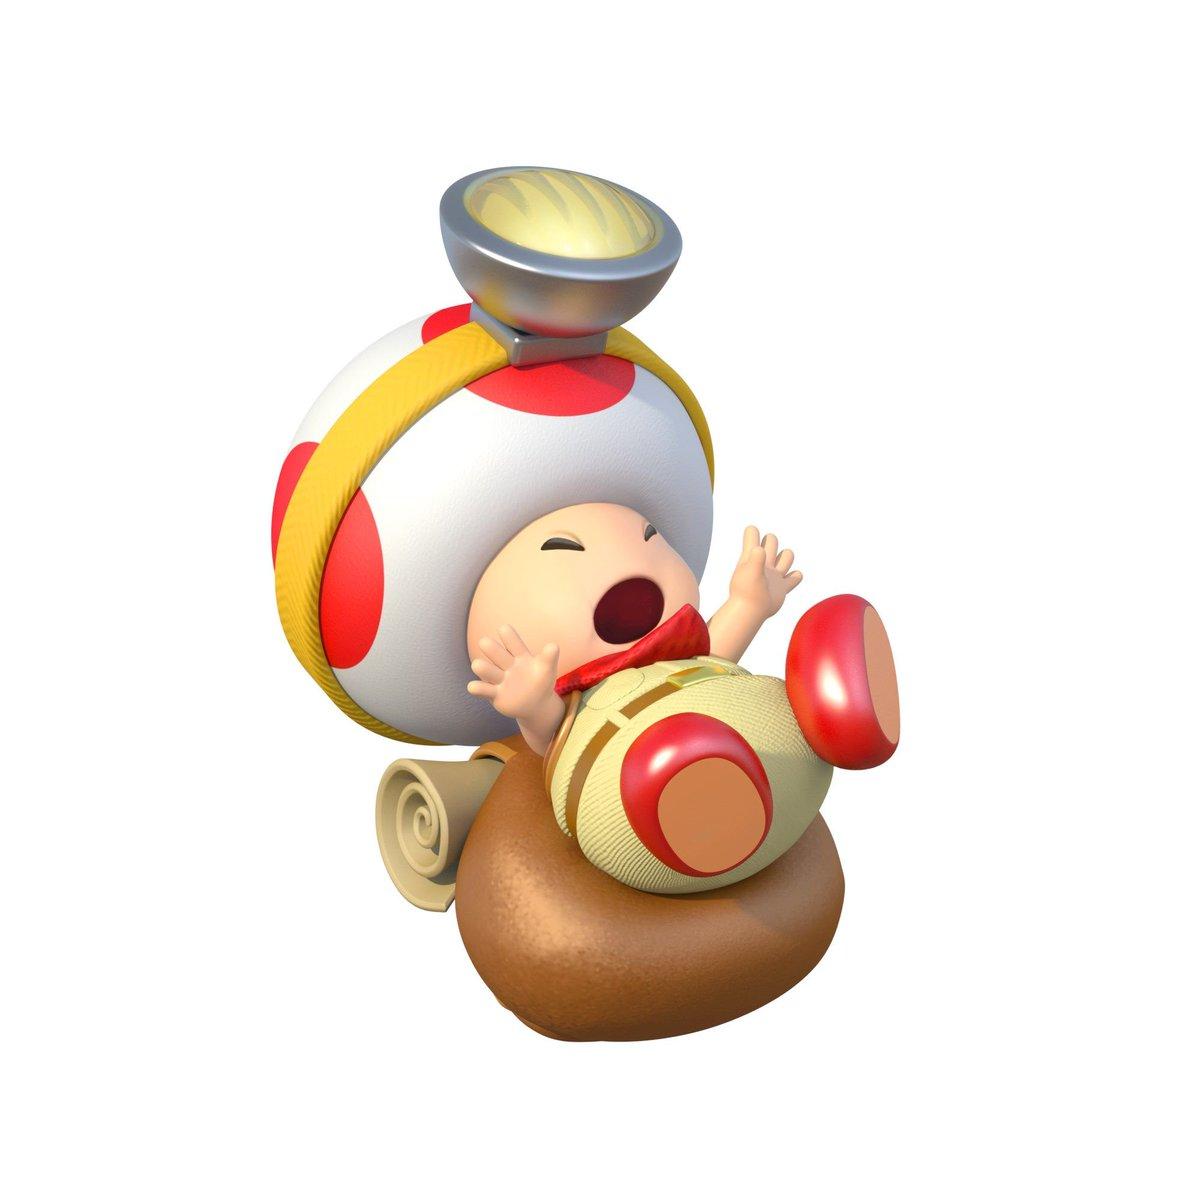 Greg's photo on Nintendo